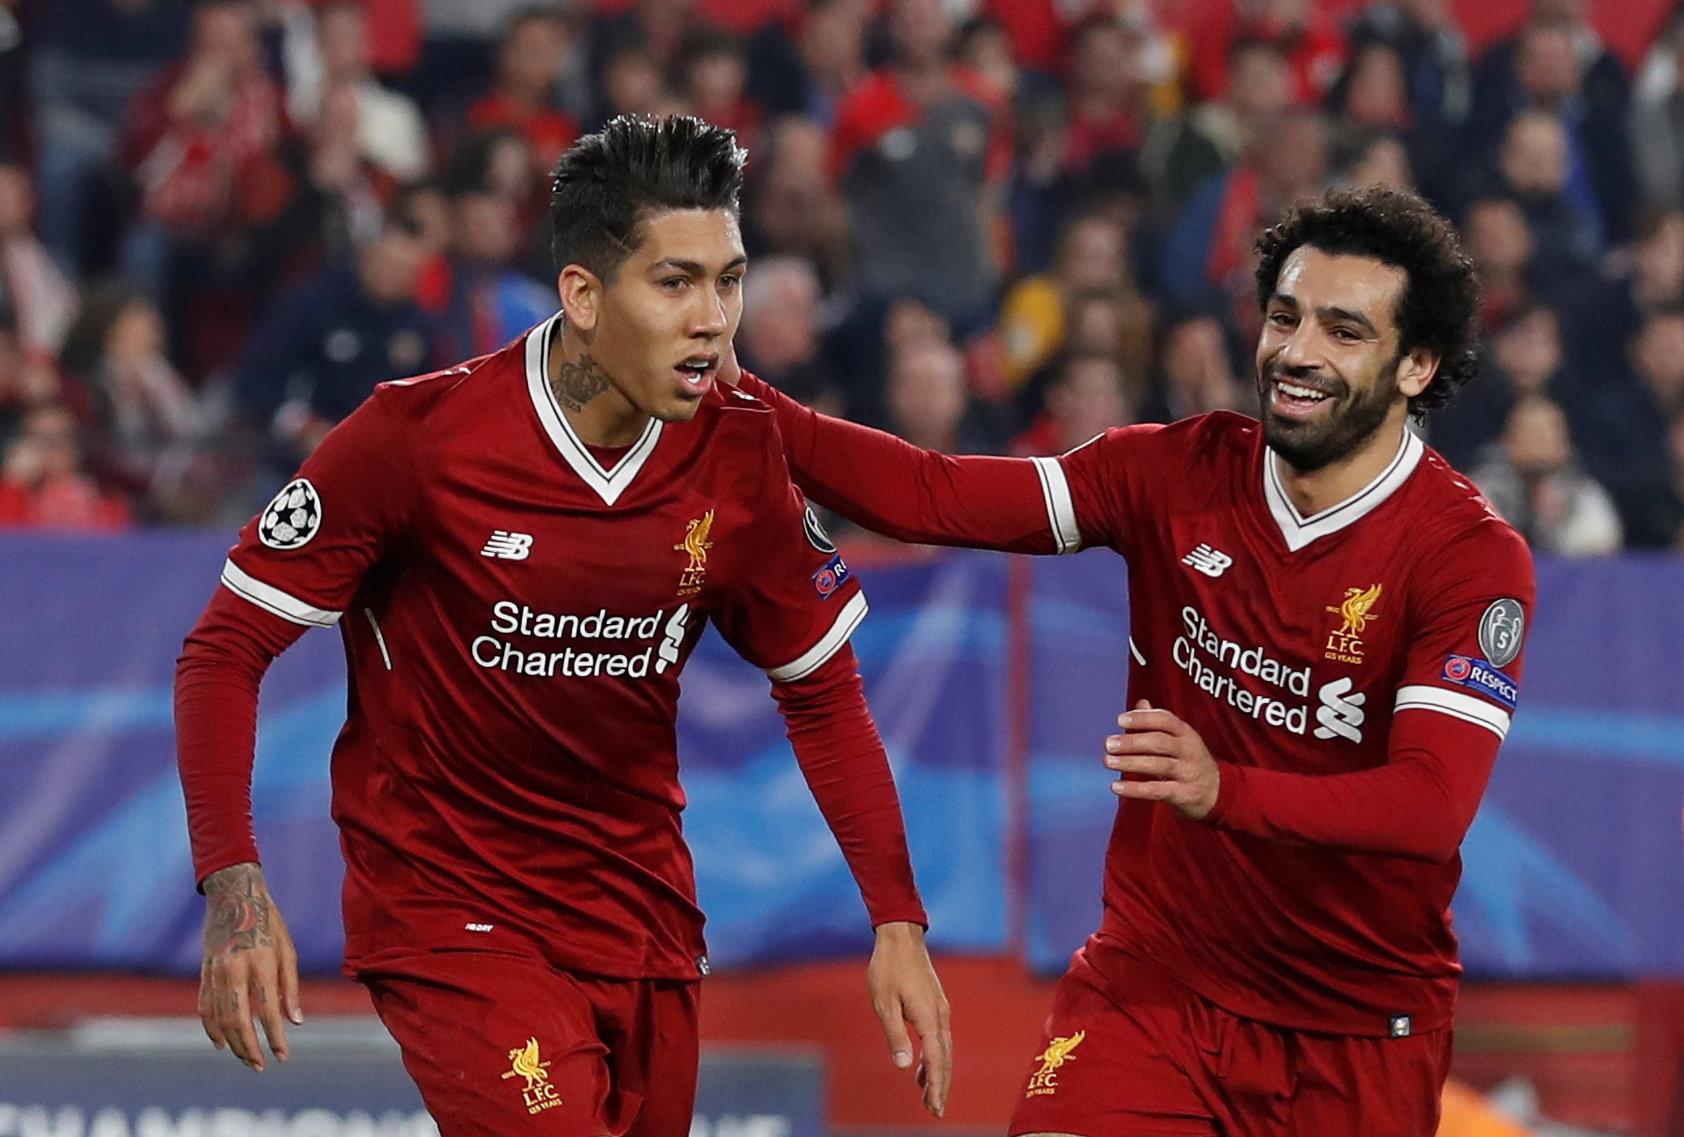 Football - Ligue des champions - Salah, Firmino, Mané: Ce trio qui fait saliver l'Europe